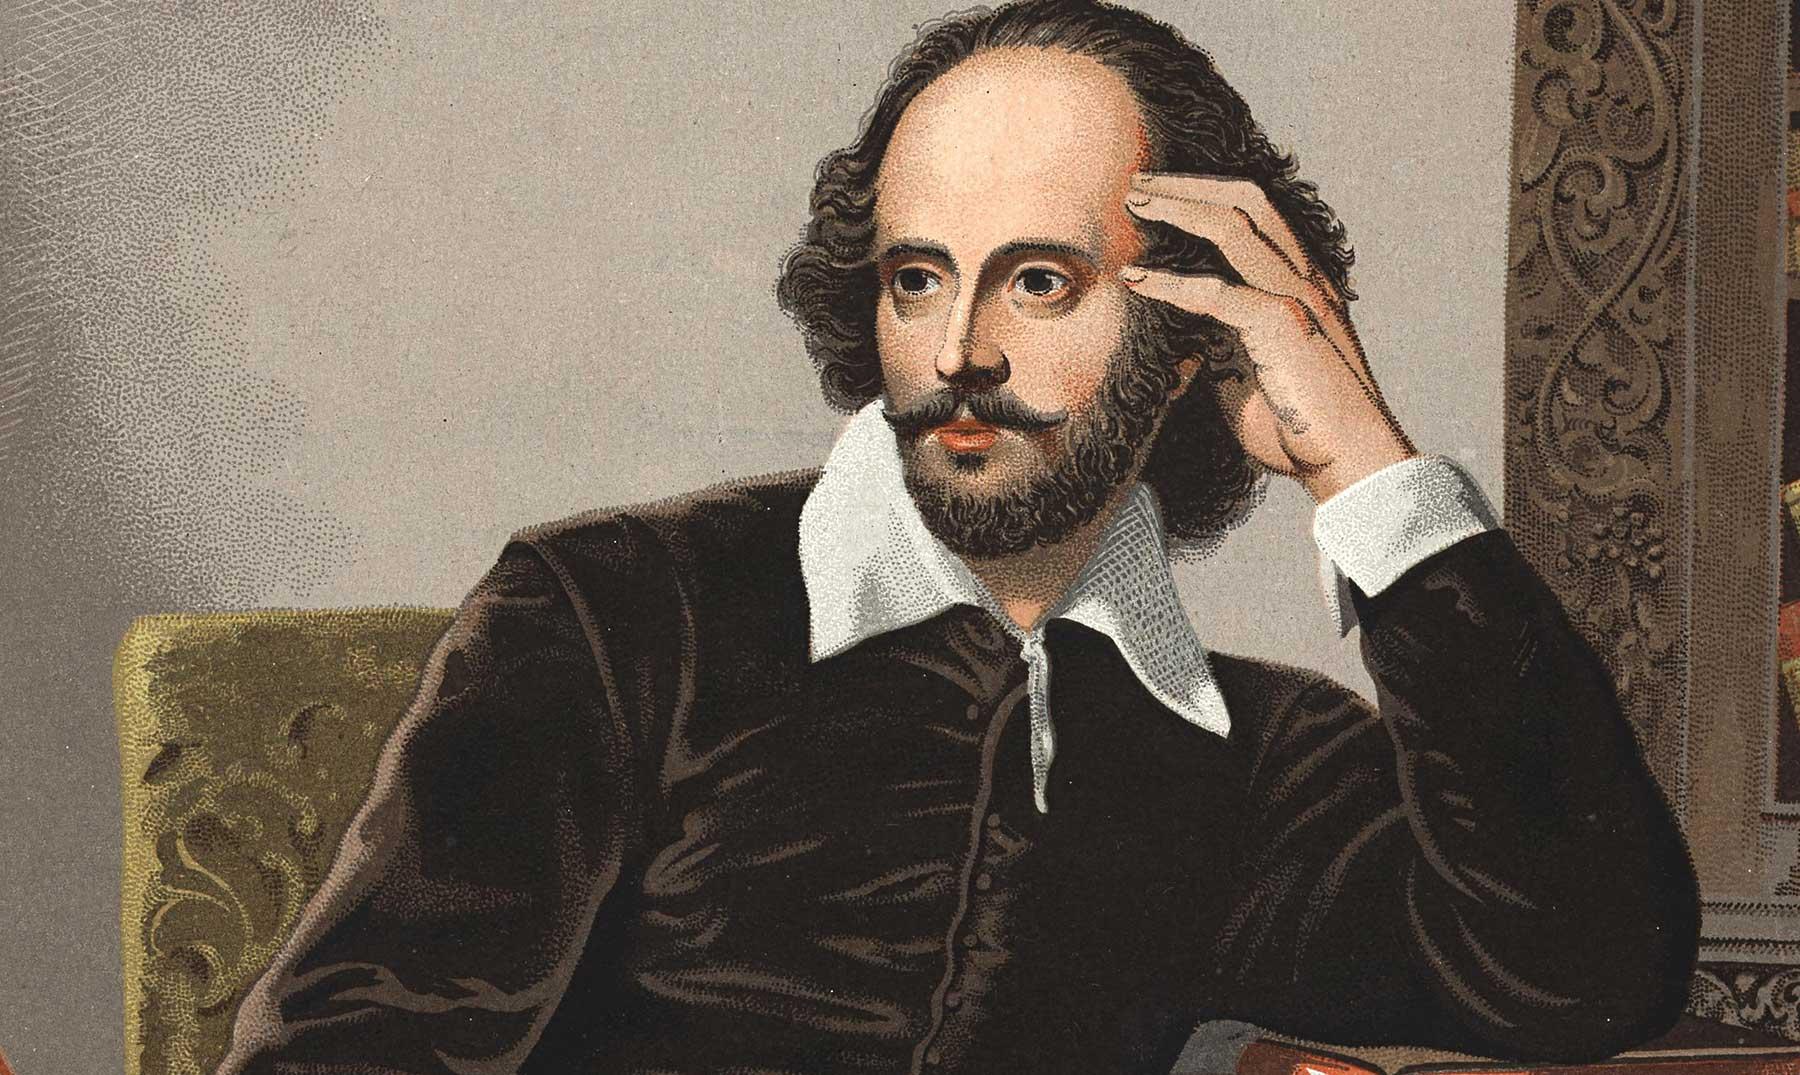 Frases de William Shakespeare sobre el amor